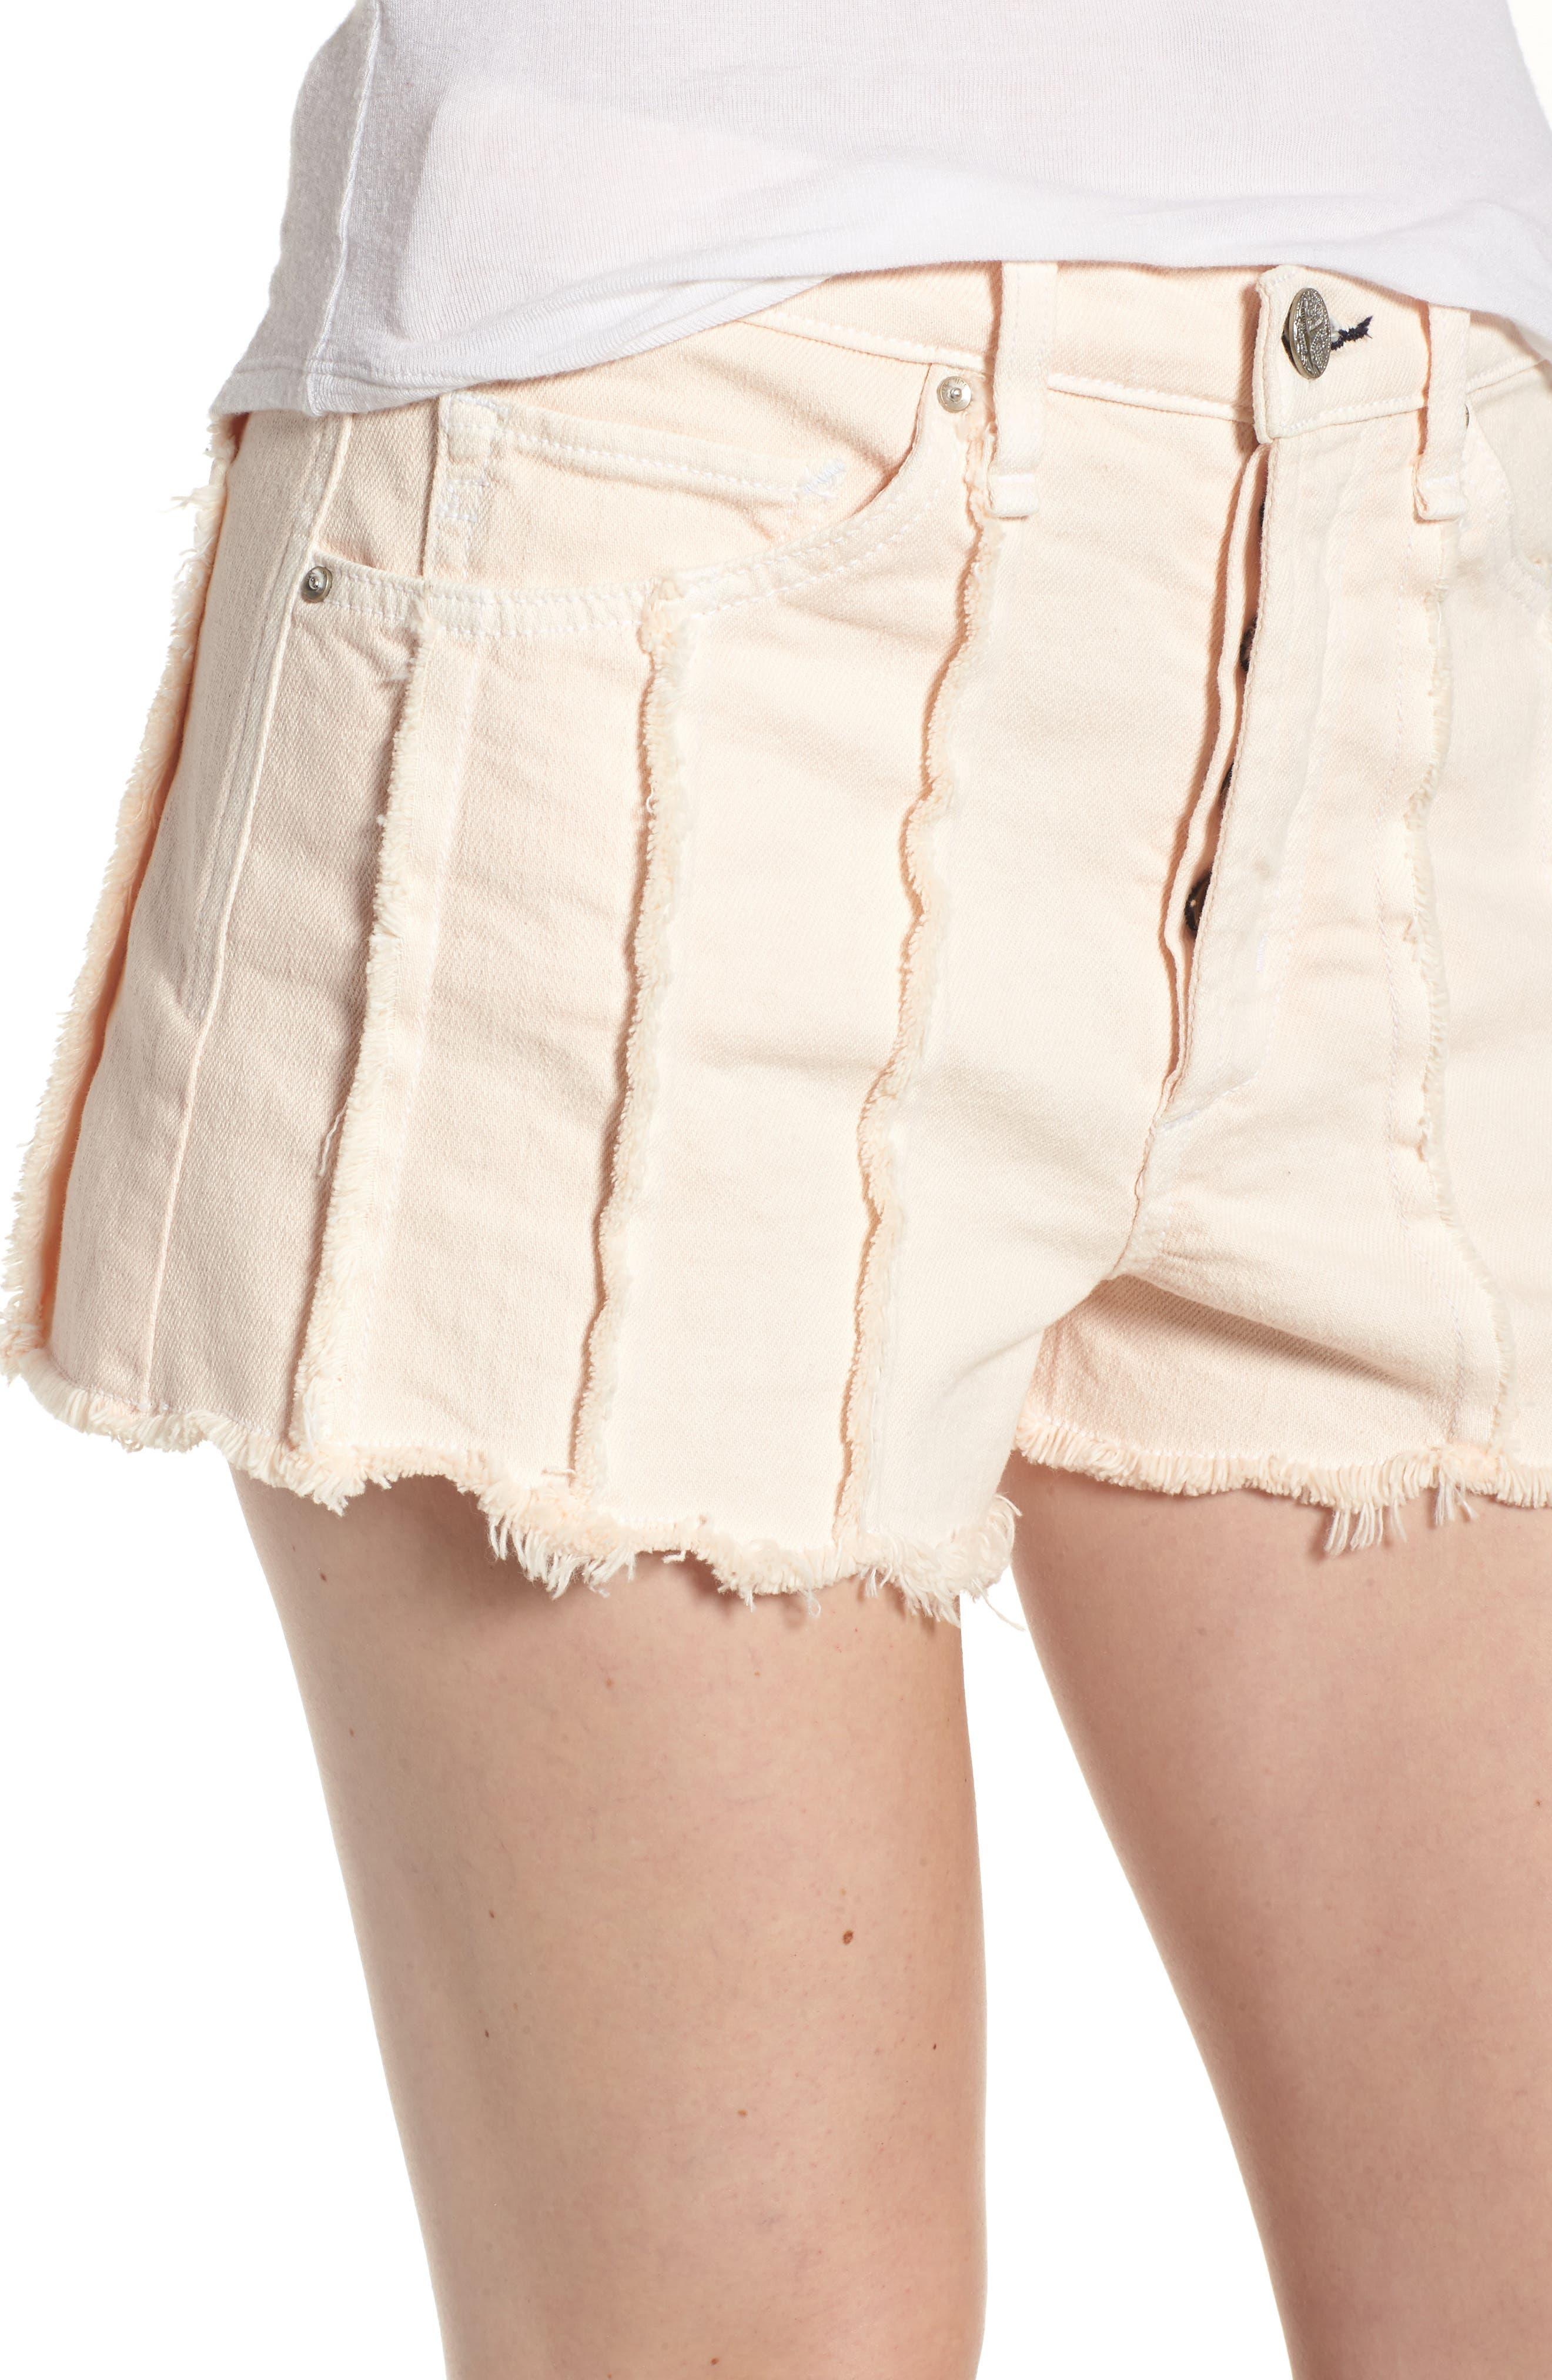 Georgia May High Waist Shorts,                             Alternate thumbnail 4, color,                             650